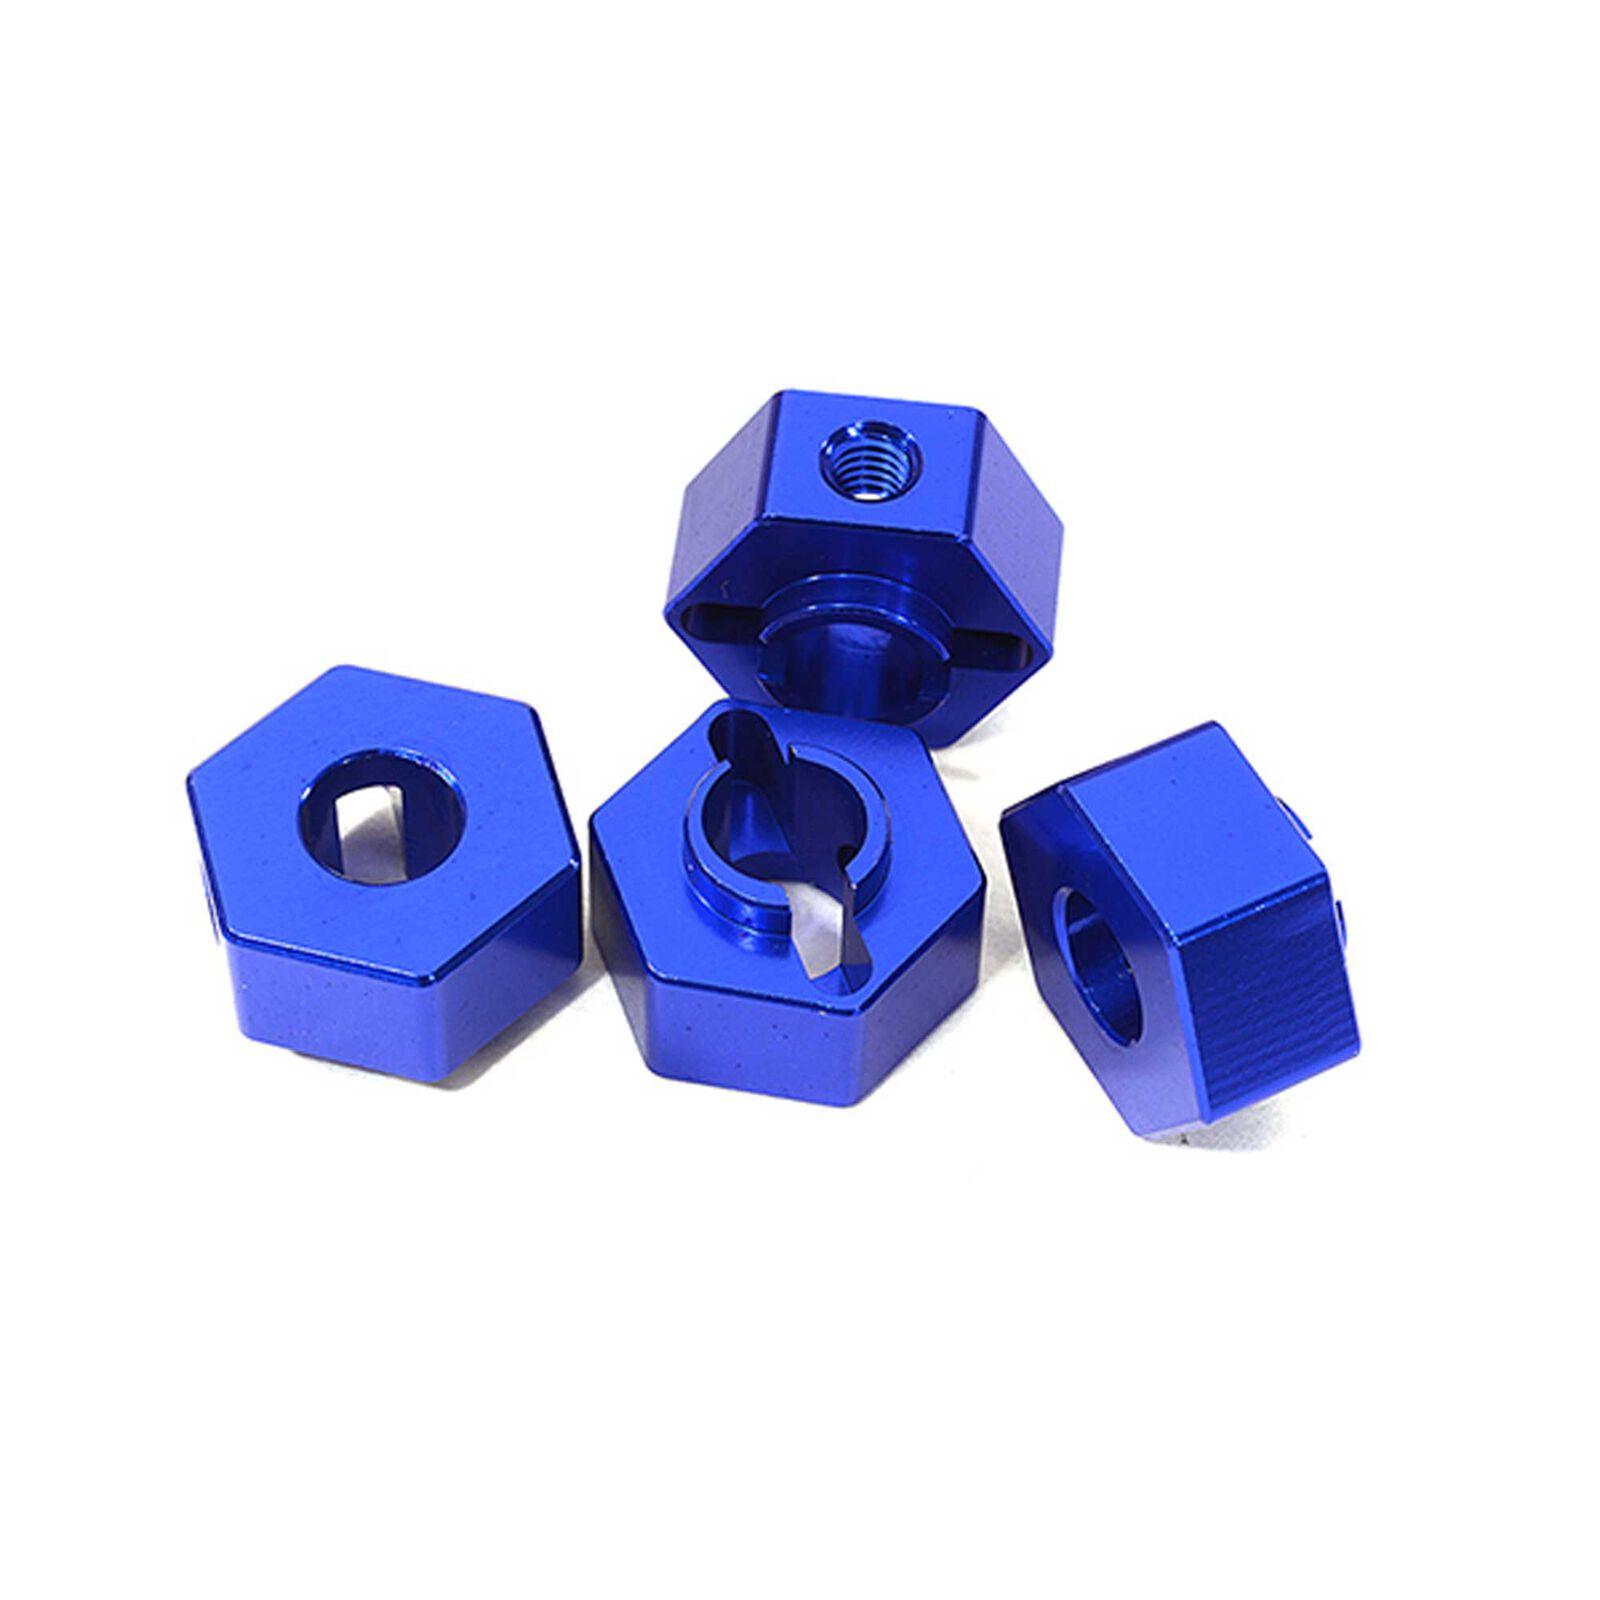 Wheel Hex, Blue (4): ARRMA 1/10 GRANITE Voltage